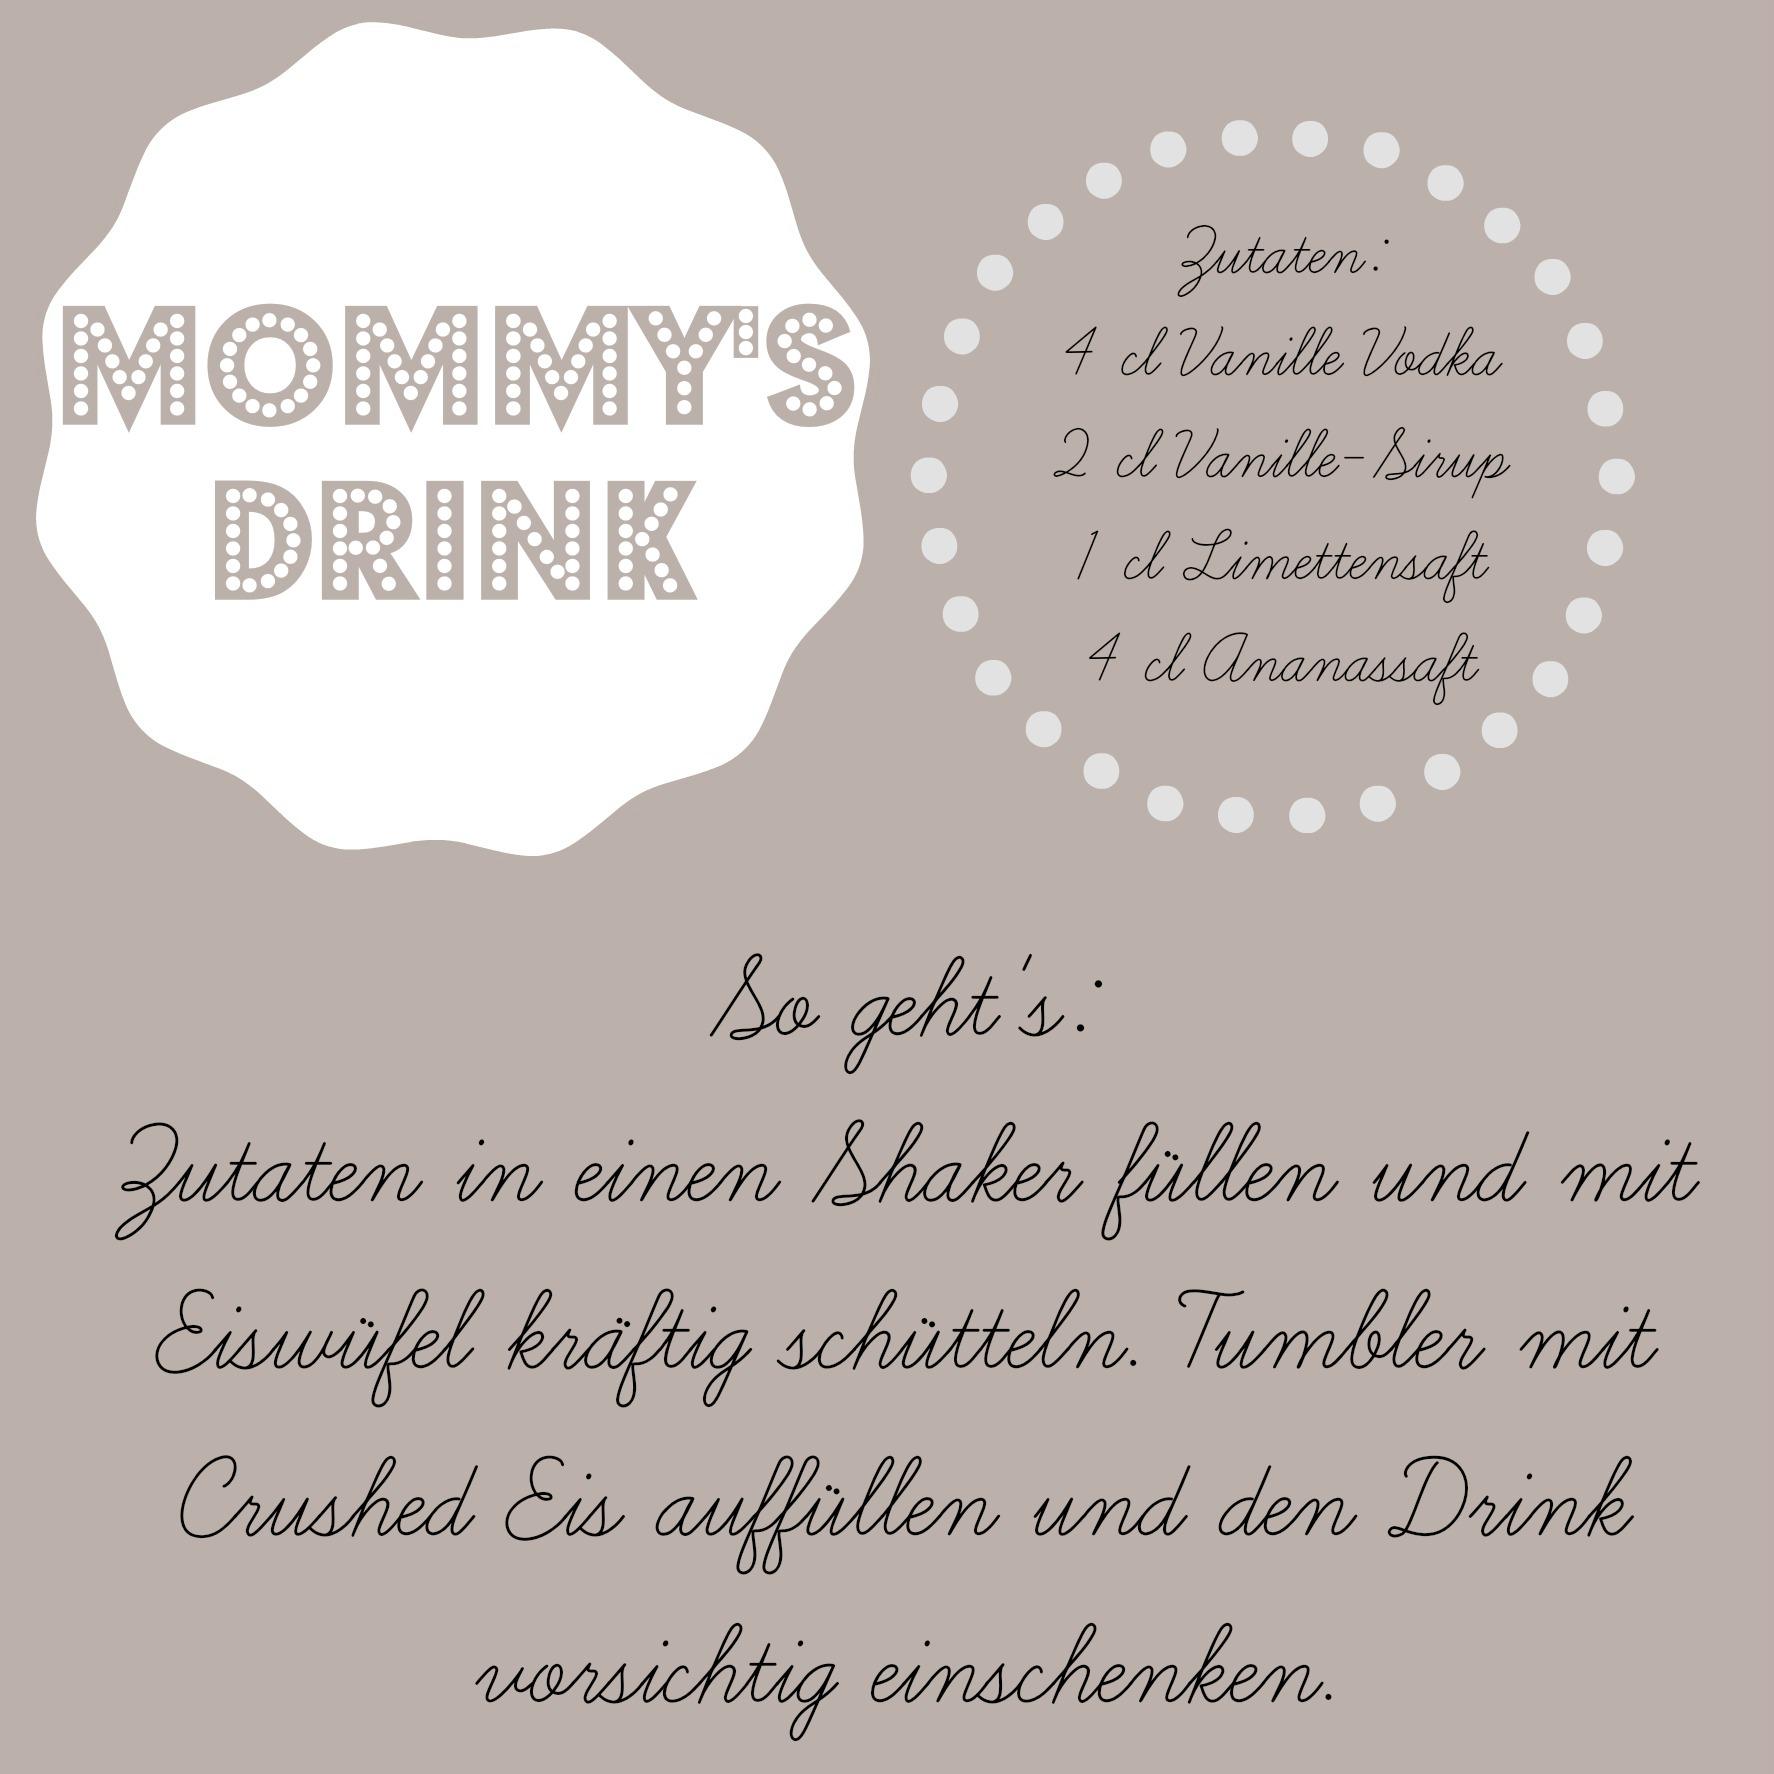 MommysDrink